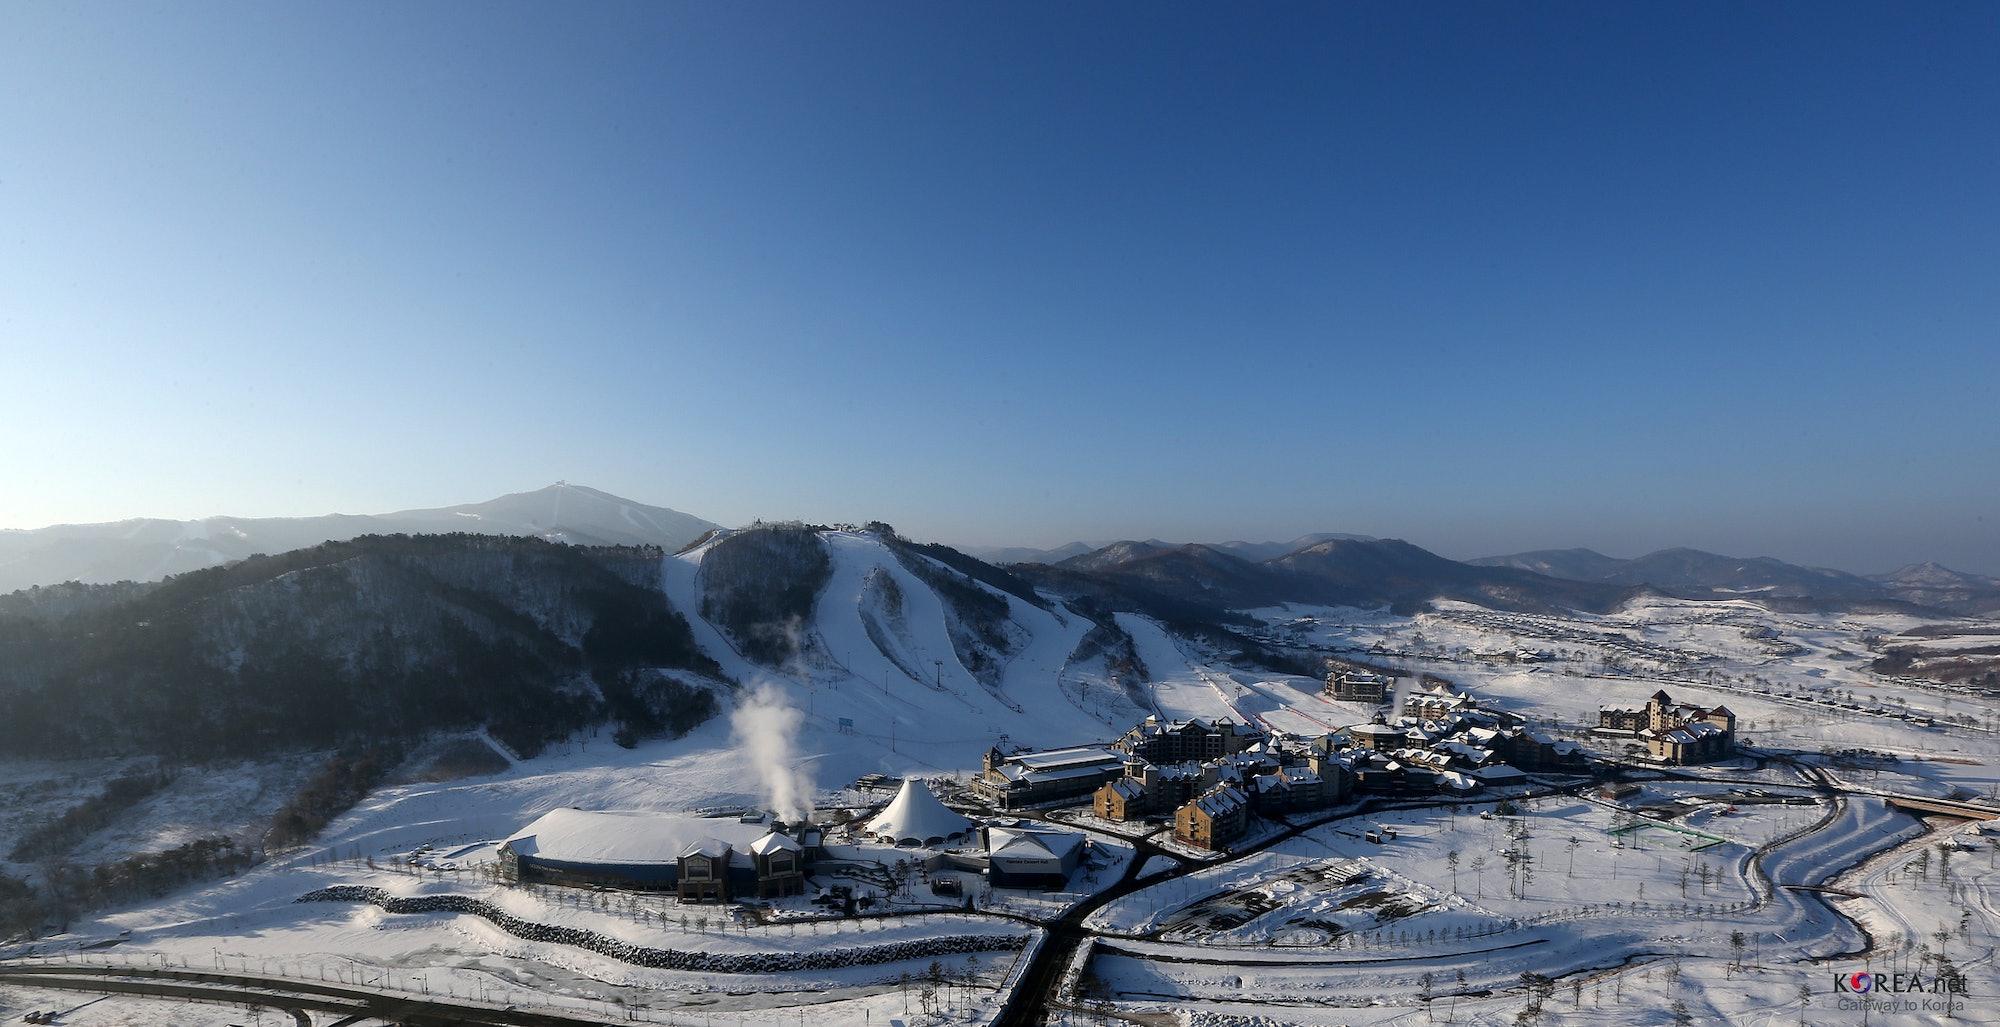 Pyeongchang, South Korea